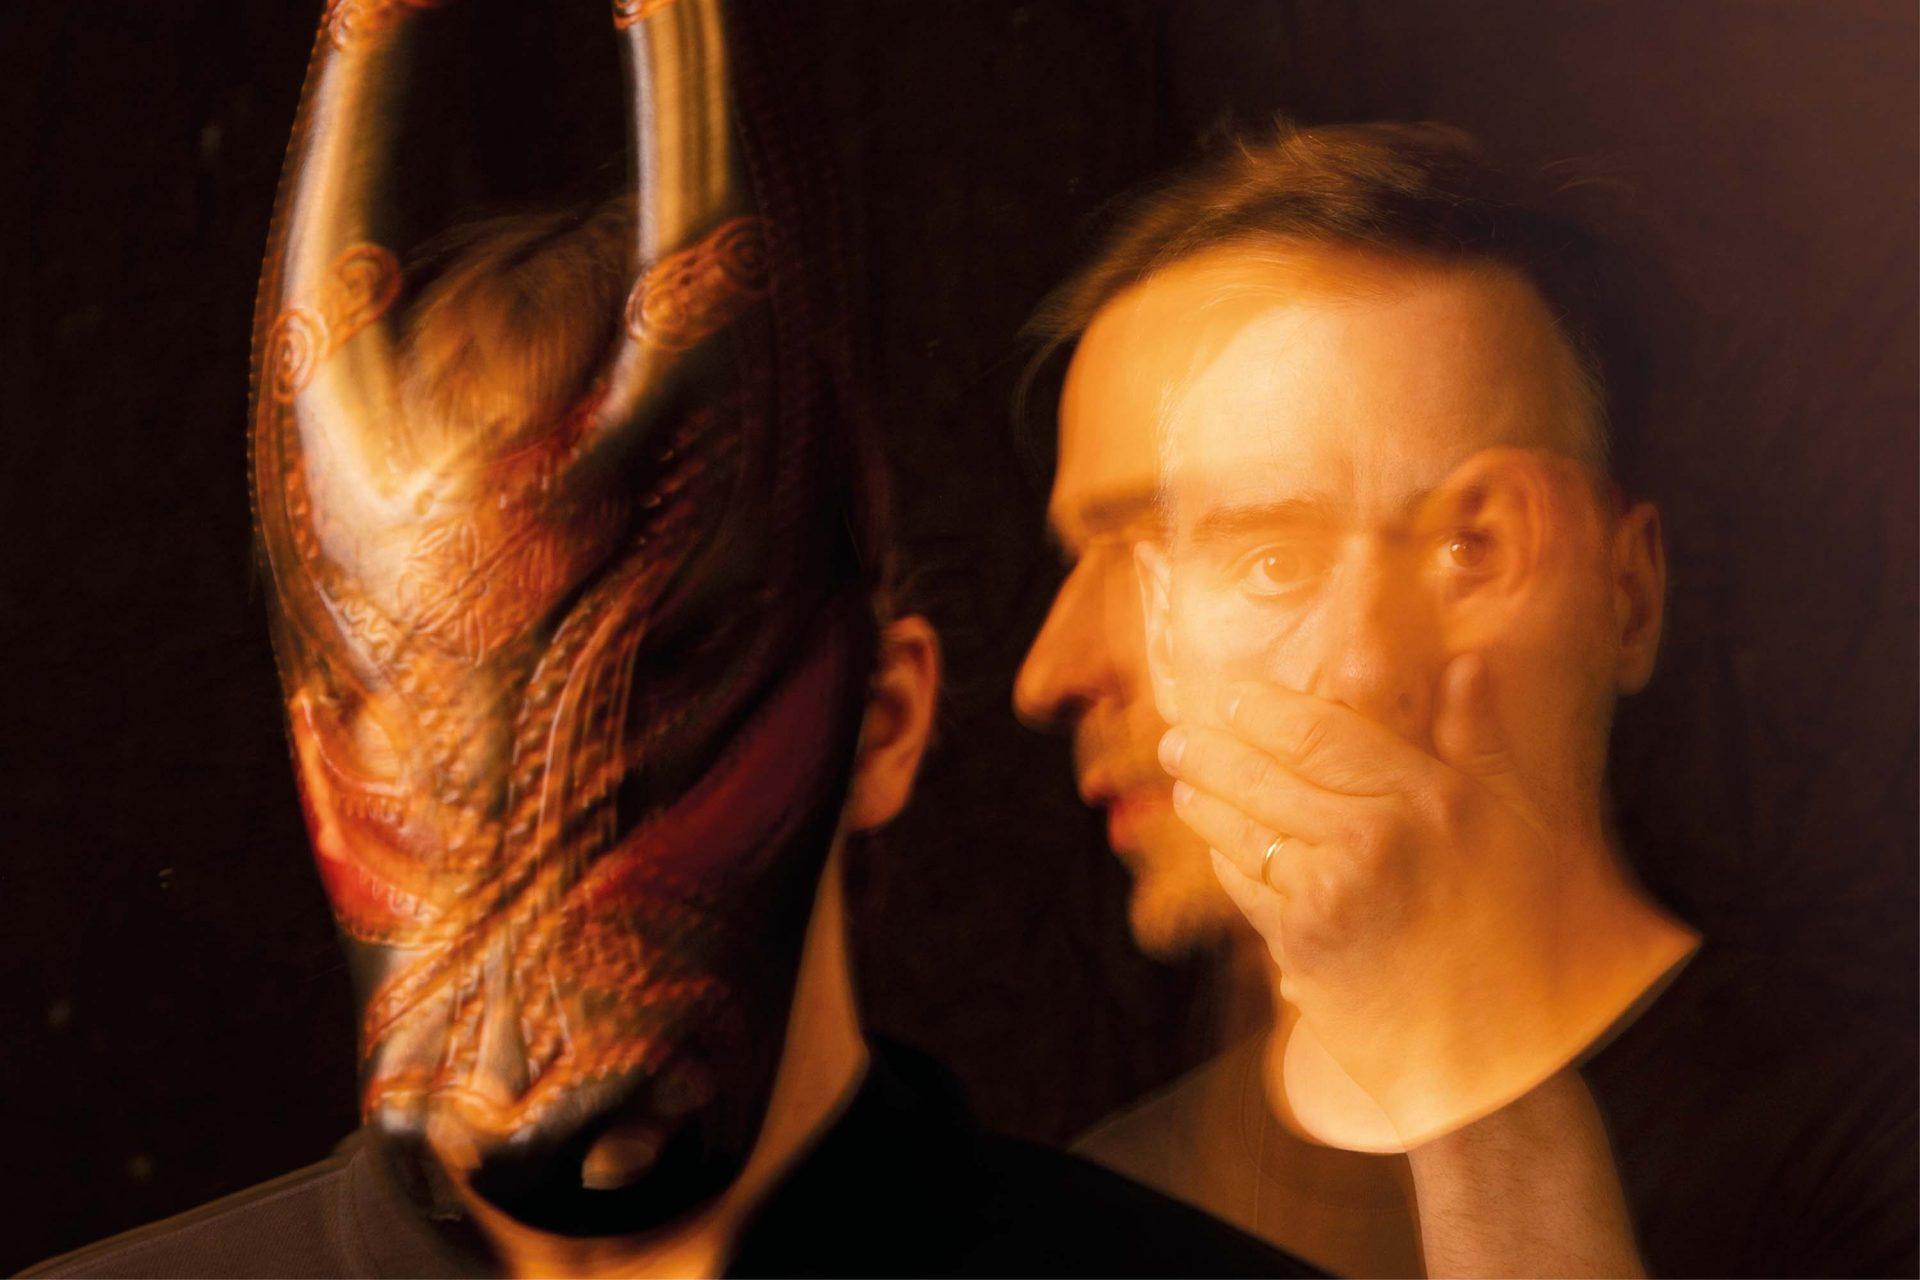 Stimming x Lambert's new single Glühwürmchen drops today